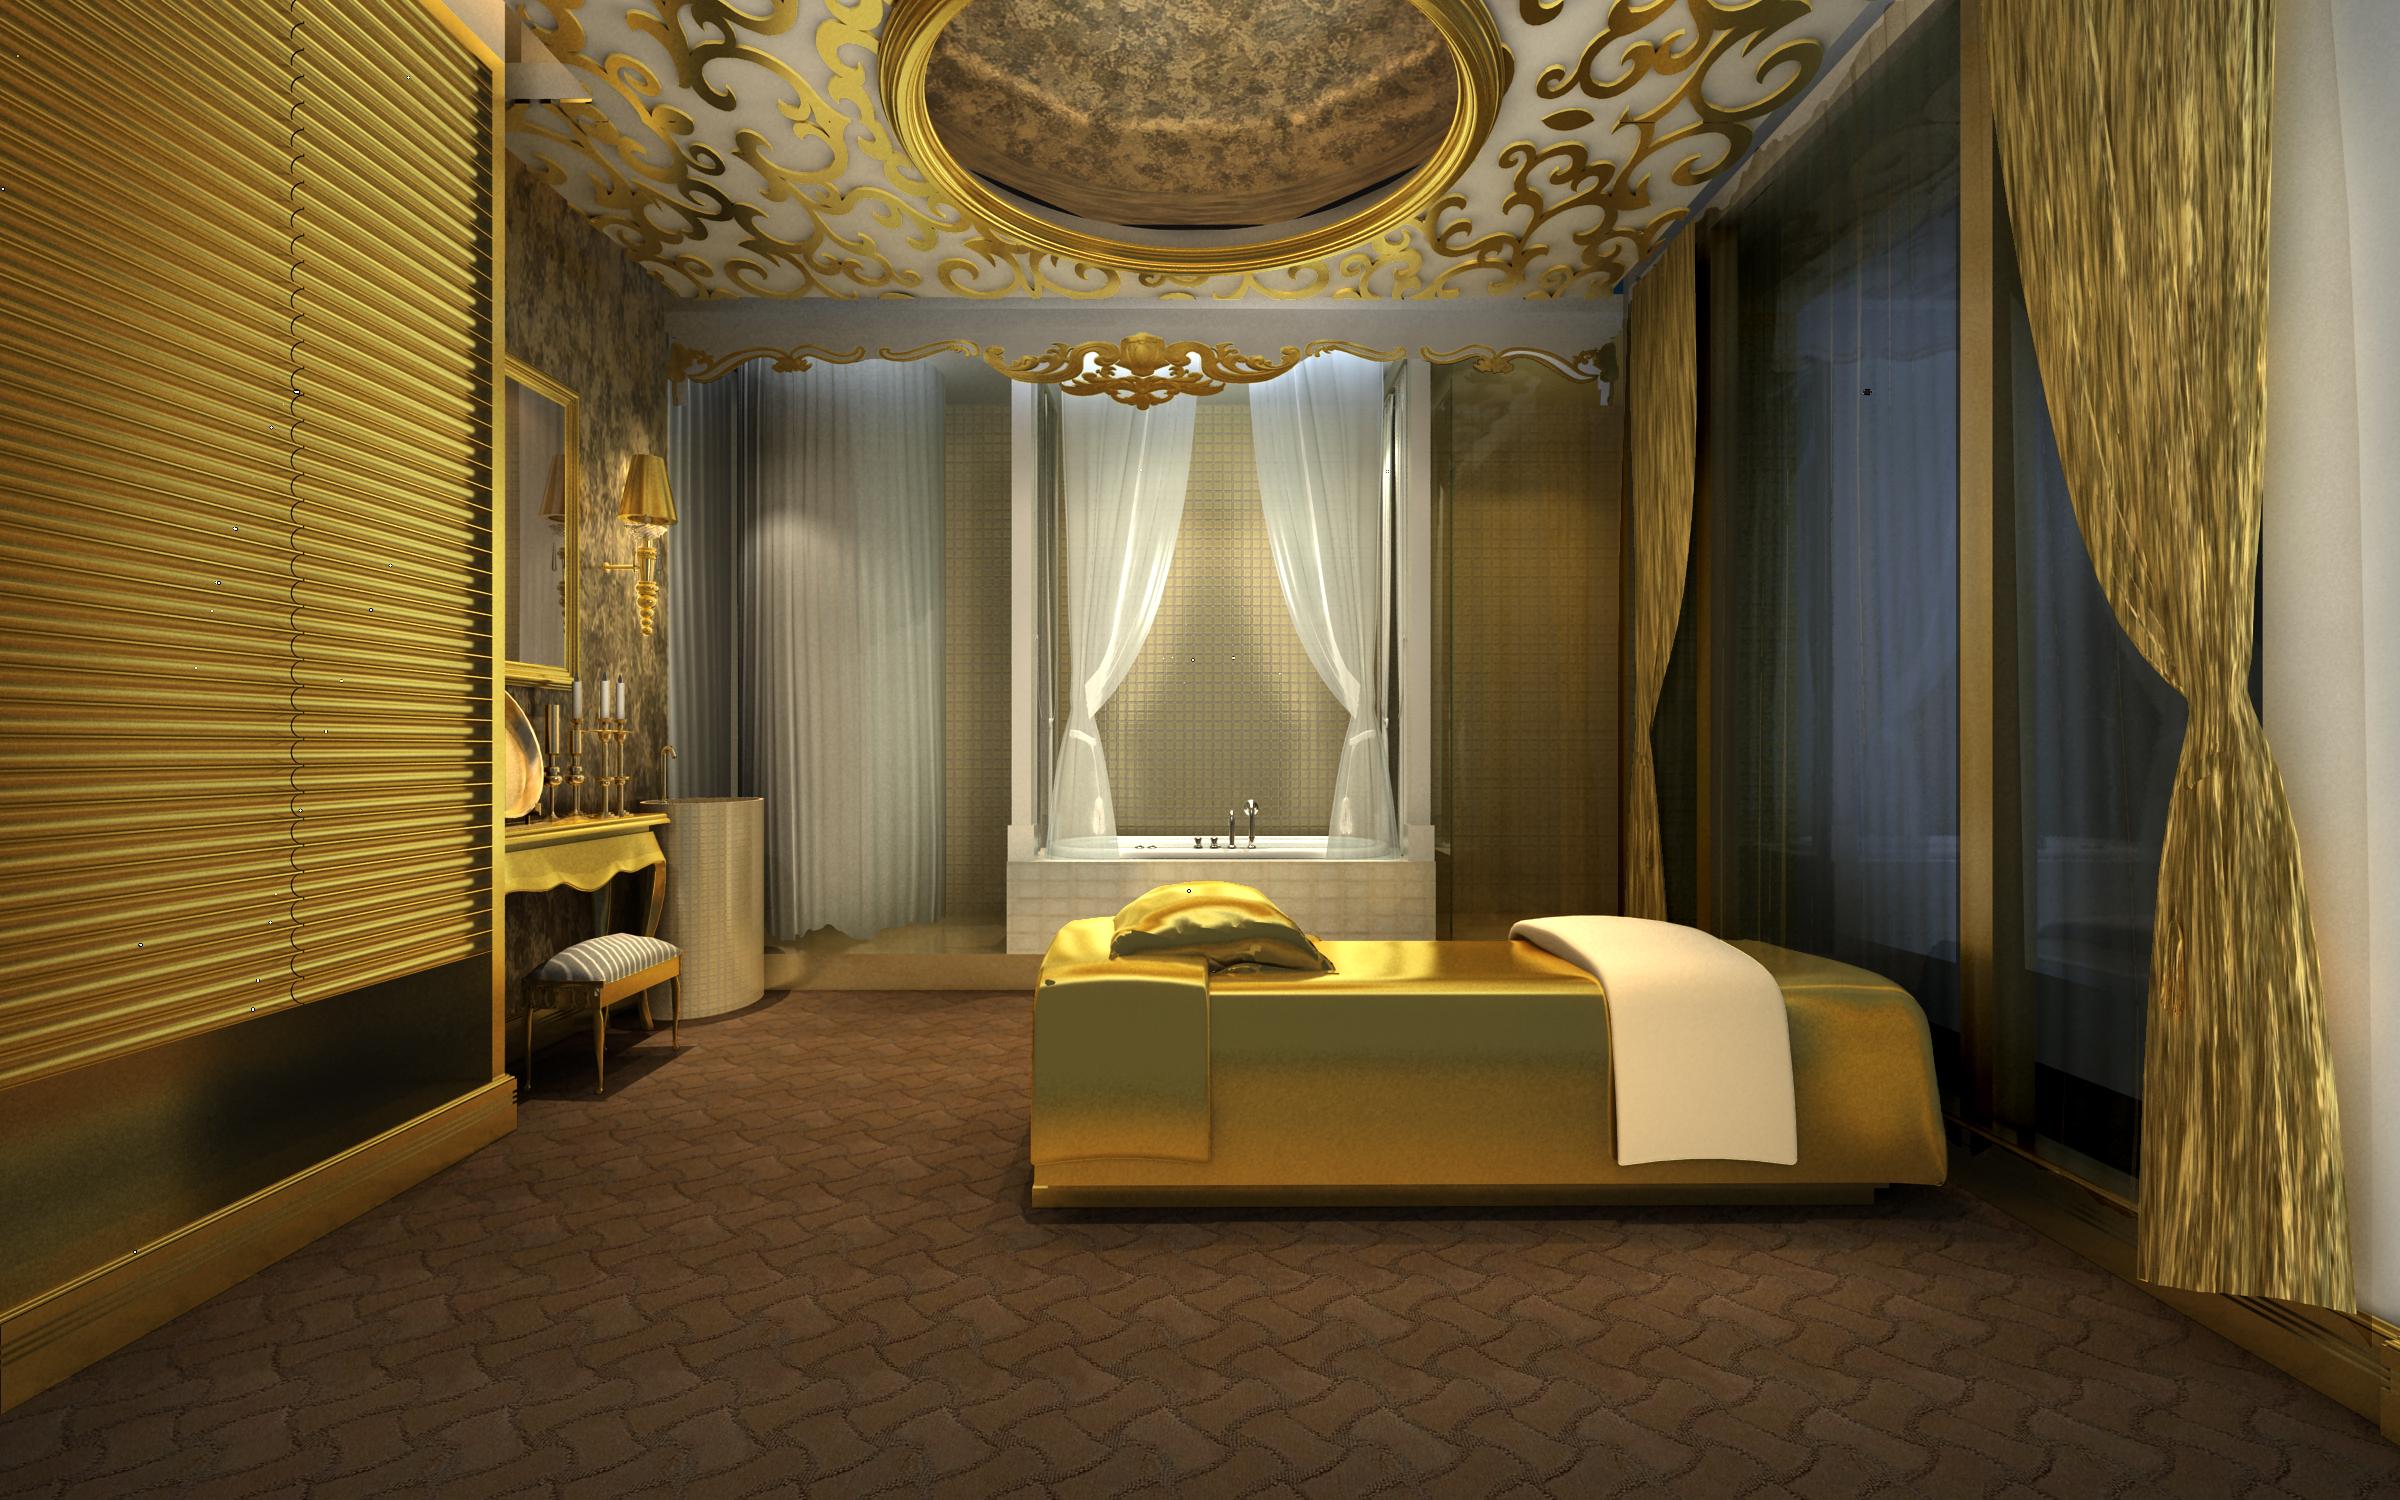 spa istaba 025 3d modelis max 137967